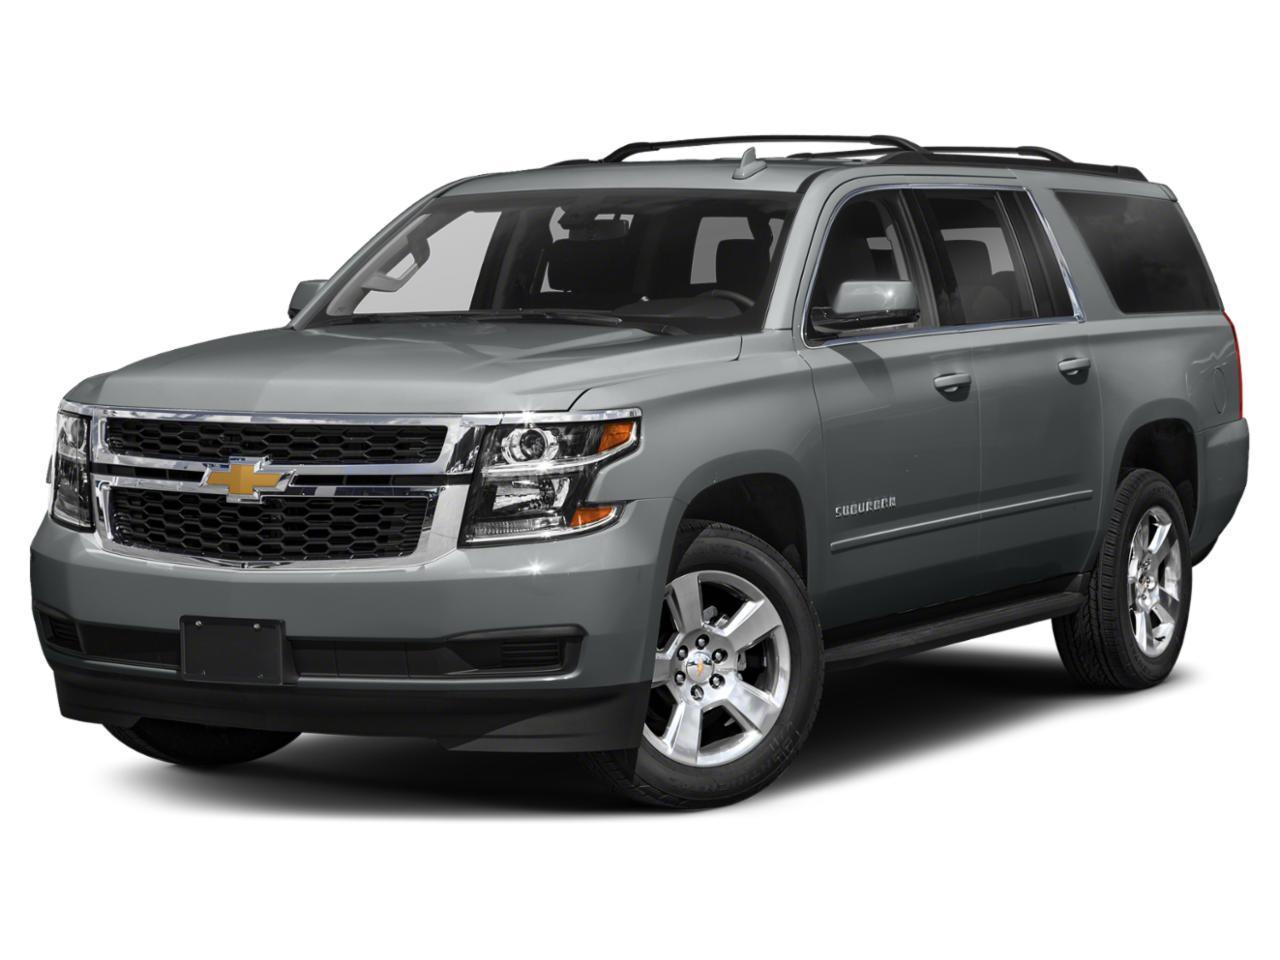 2019 Chevrolet Suburban Vehicle Photo in Baton Rouge, LA 70806